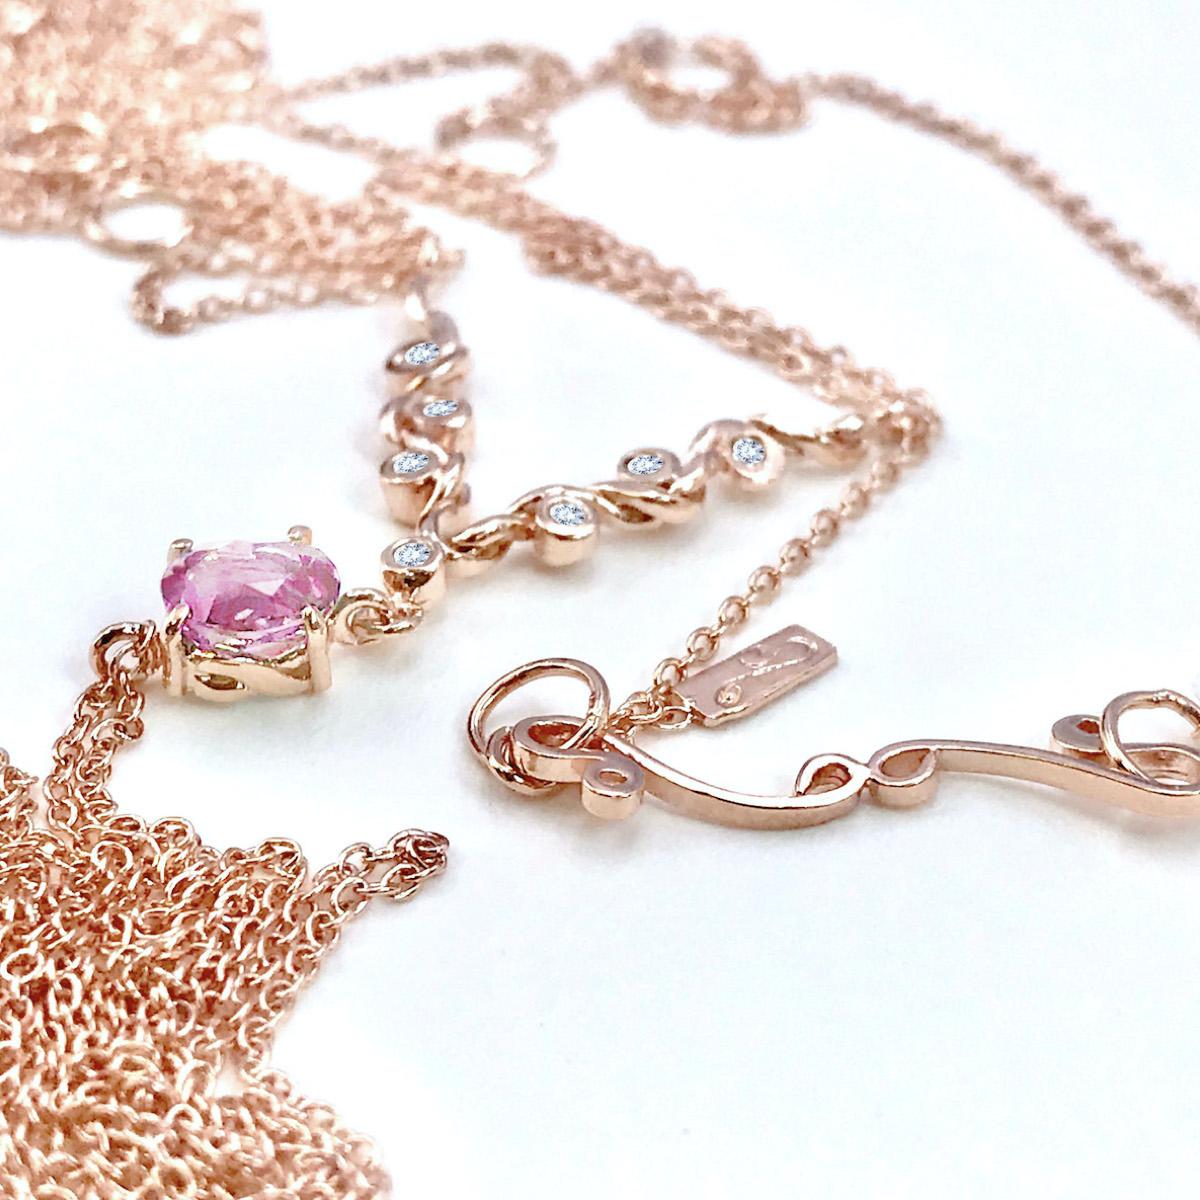 PinkTourmaline-RG_7952